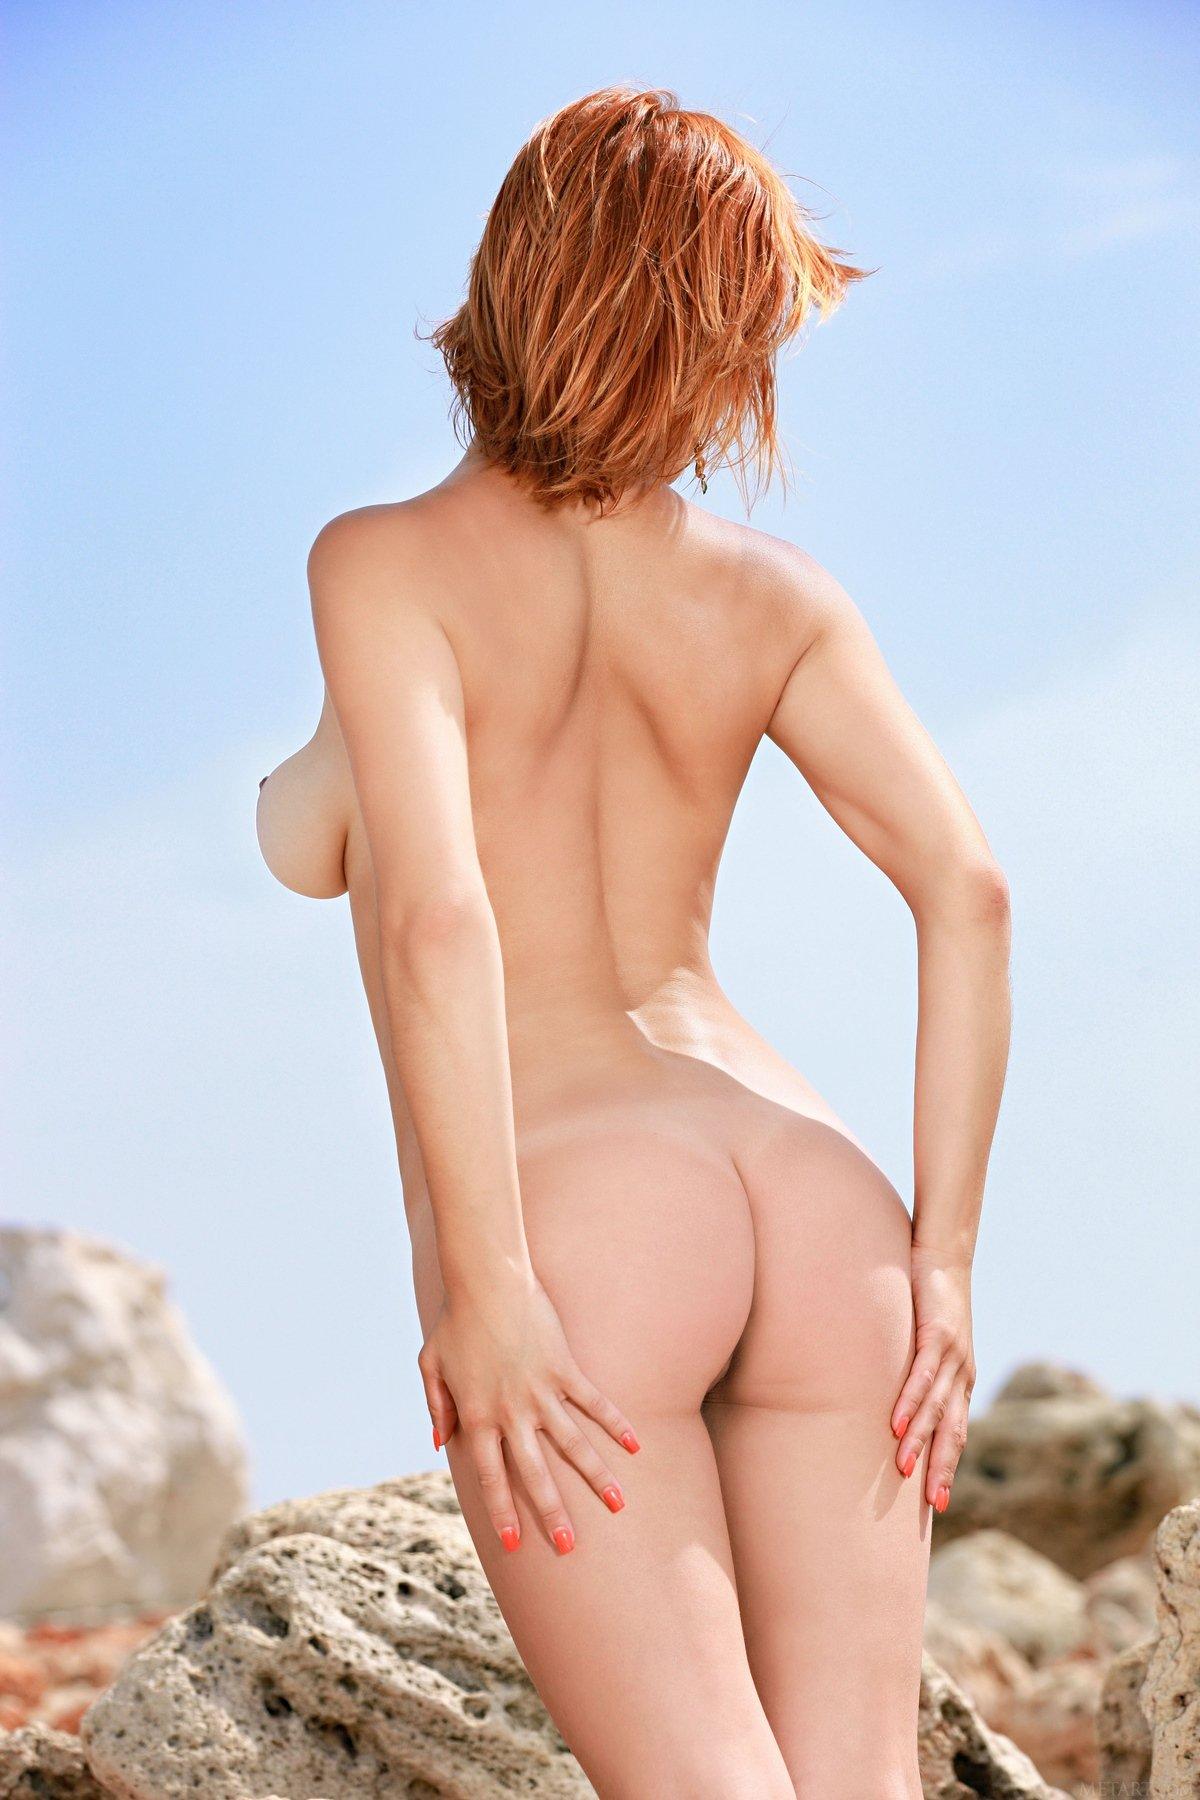 Раздетая рыжеволосая девушка ест вишни сидя на камнях секс фото